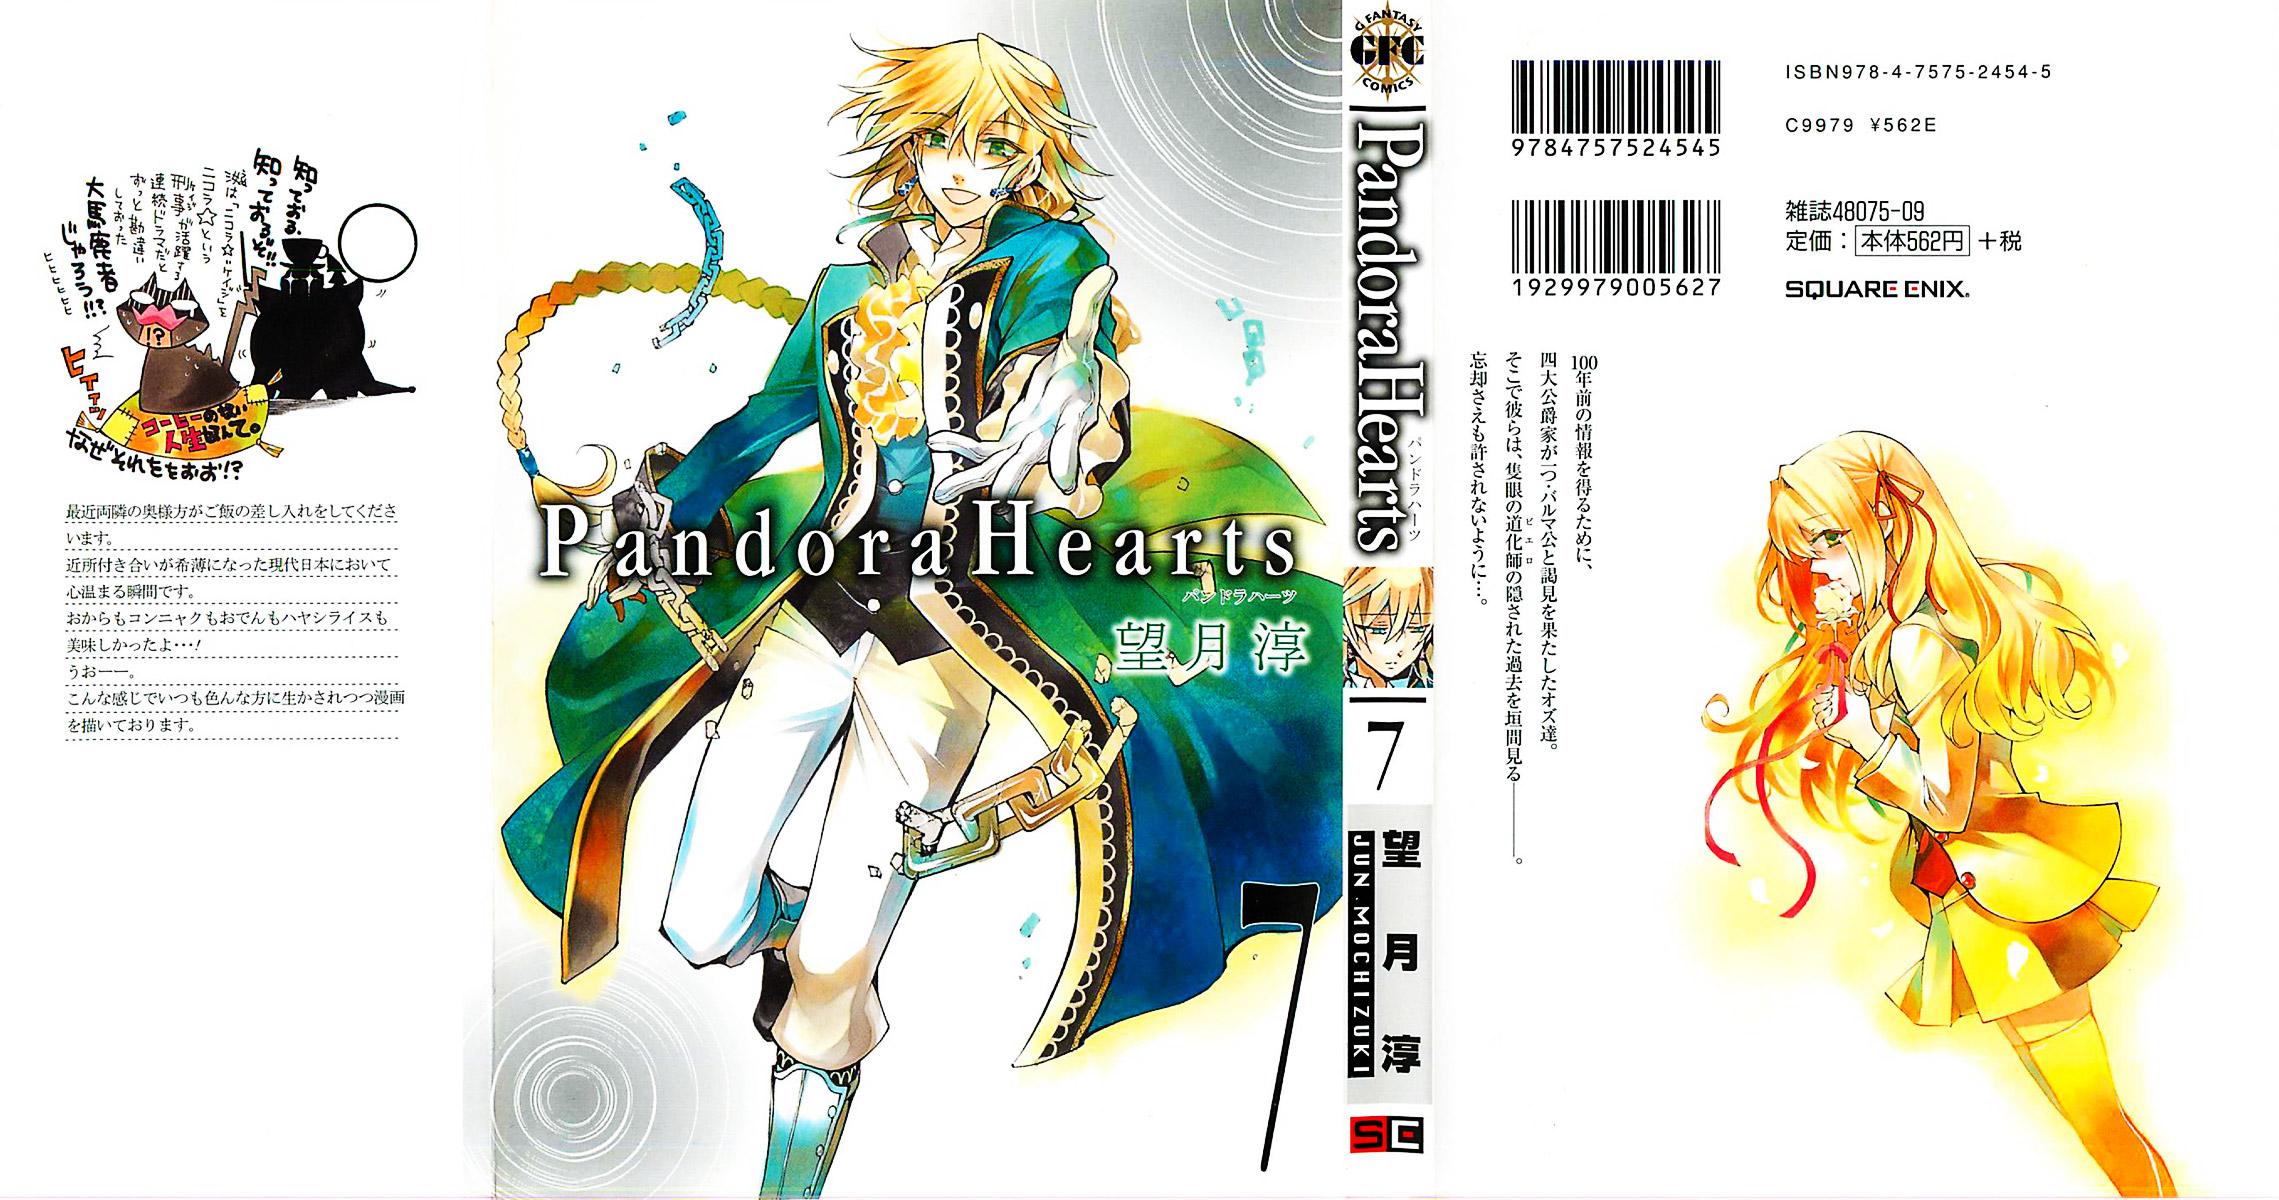 Pandora Hearts chương 027 - retrace: xxvii get out of the pool trang 1